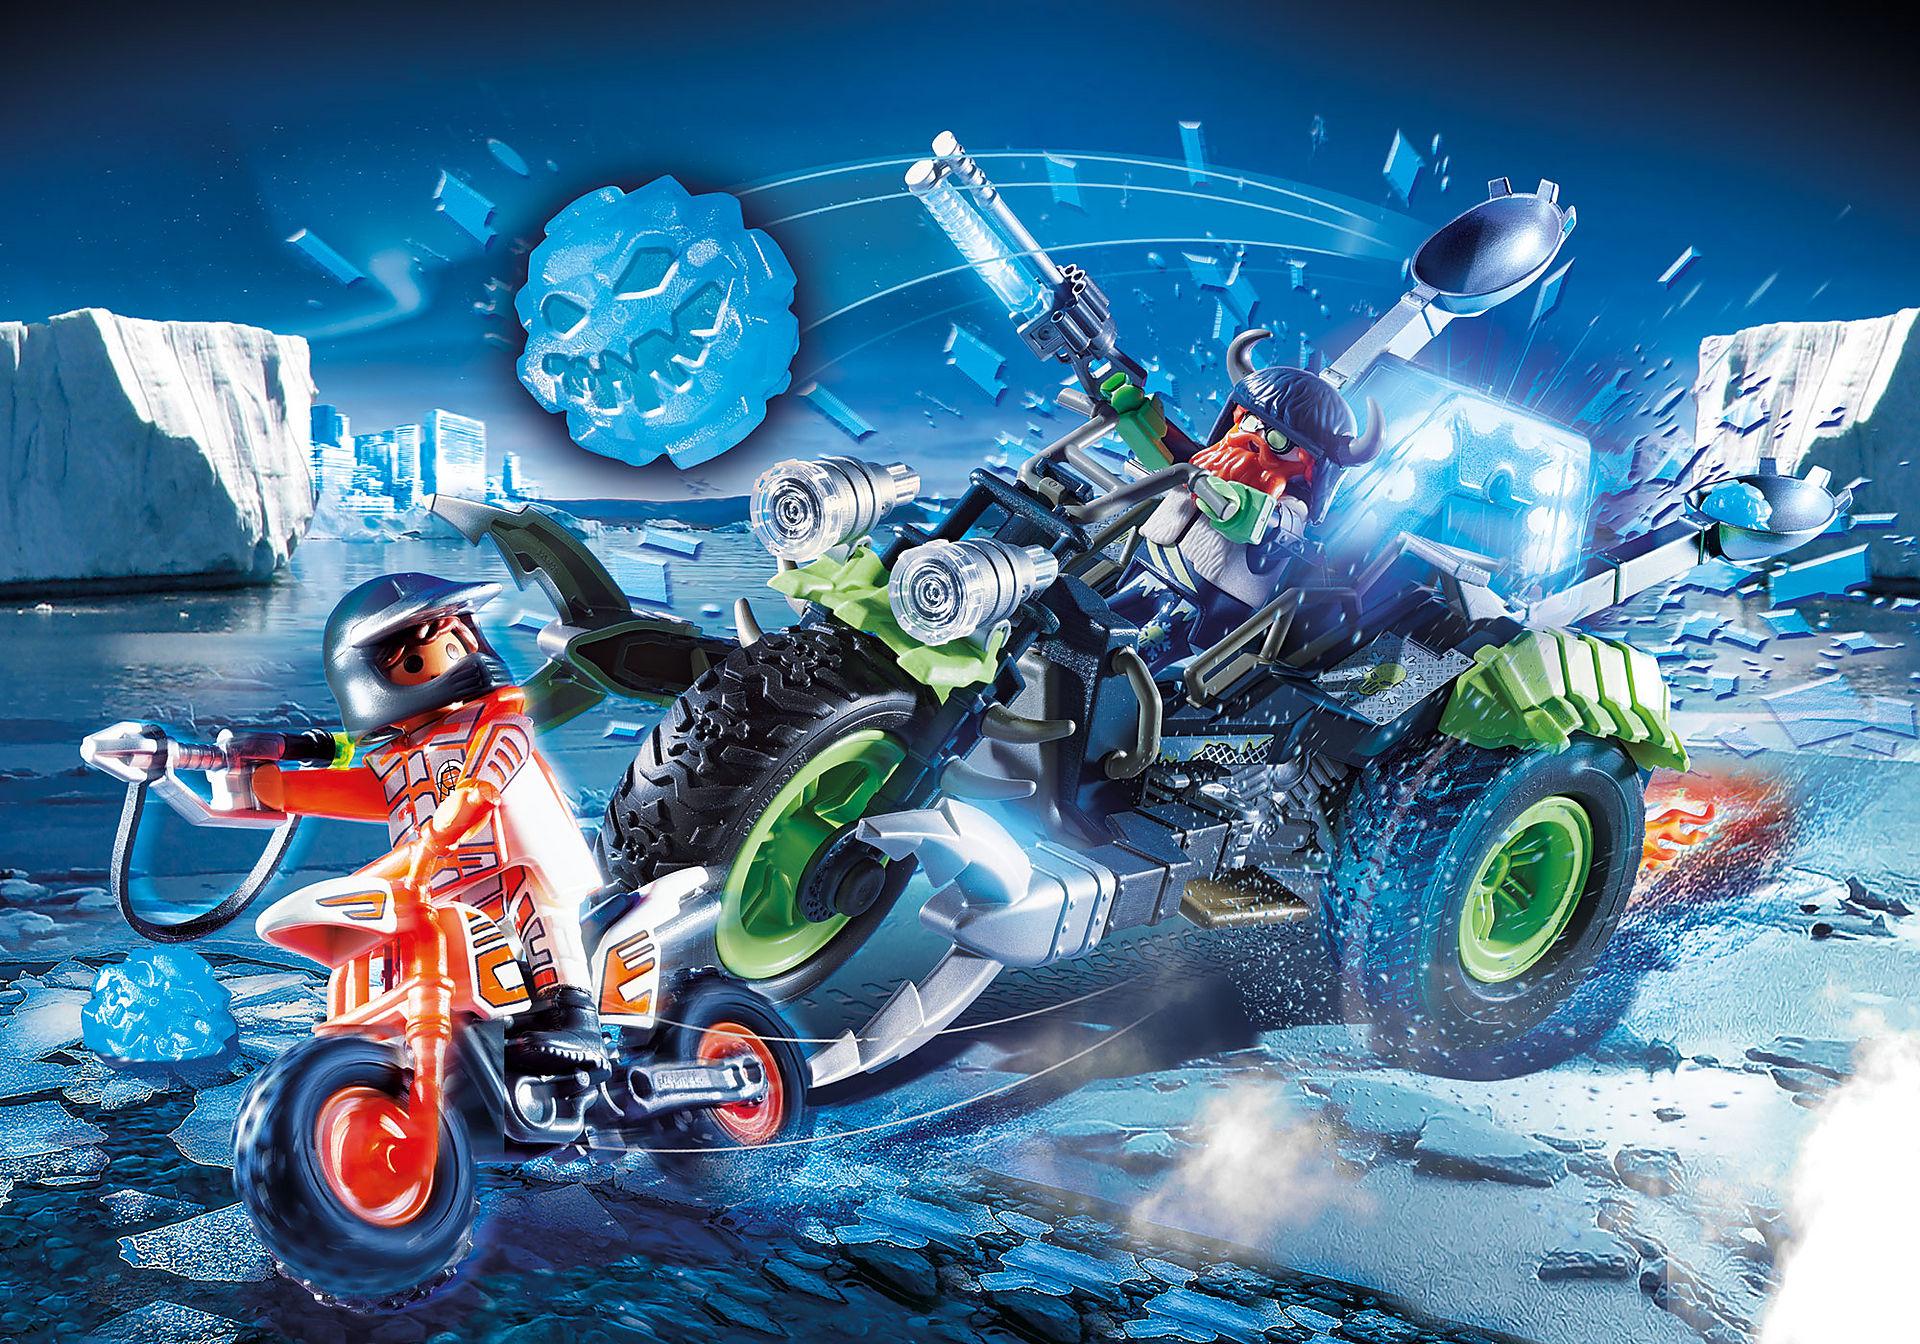 70232 Arctic Rebels Triciclo de Hielo zoom image1